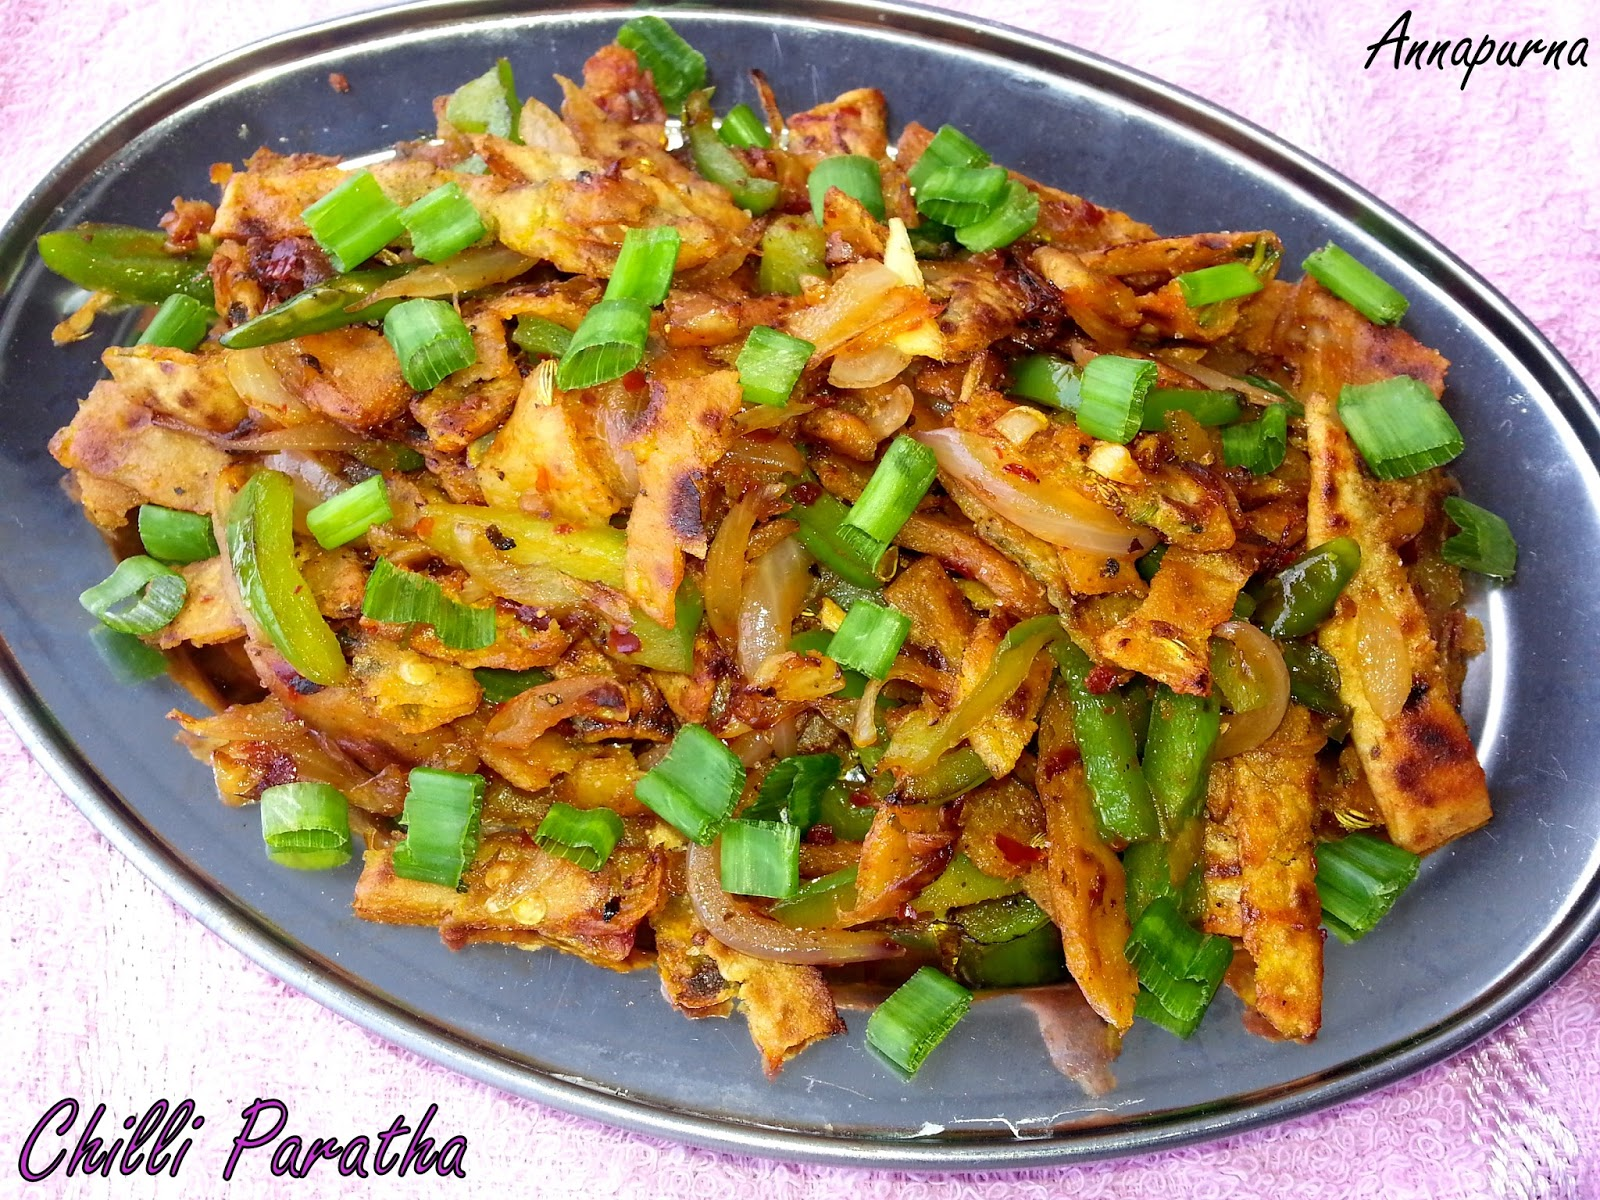 Annapurna chili paratha south indian street food vegetarian recipe chili paratha south indian street food vegetarian recipe forumfinder Images